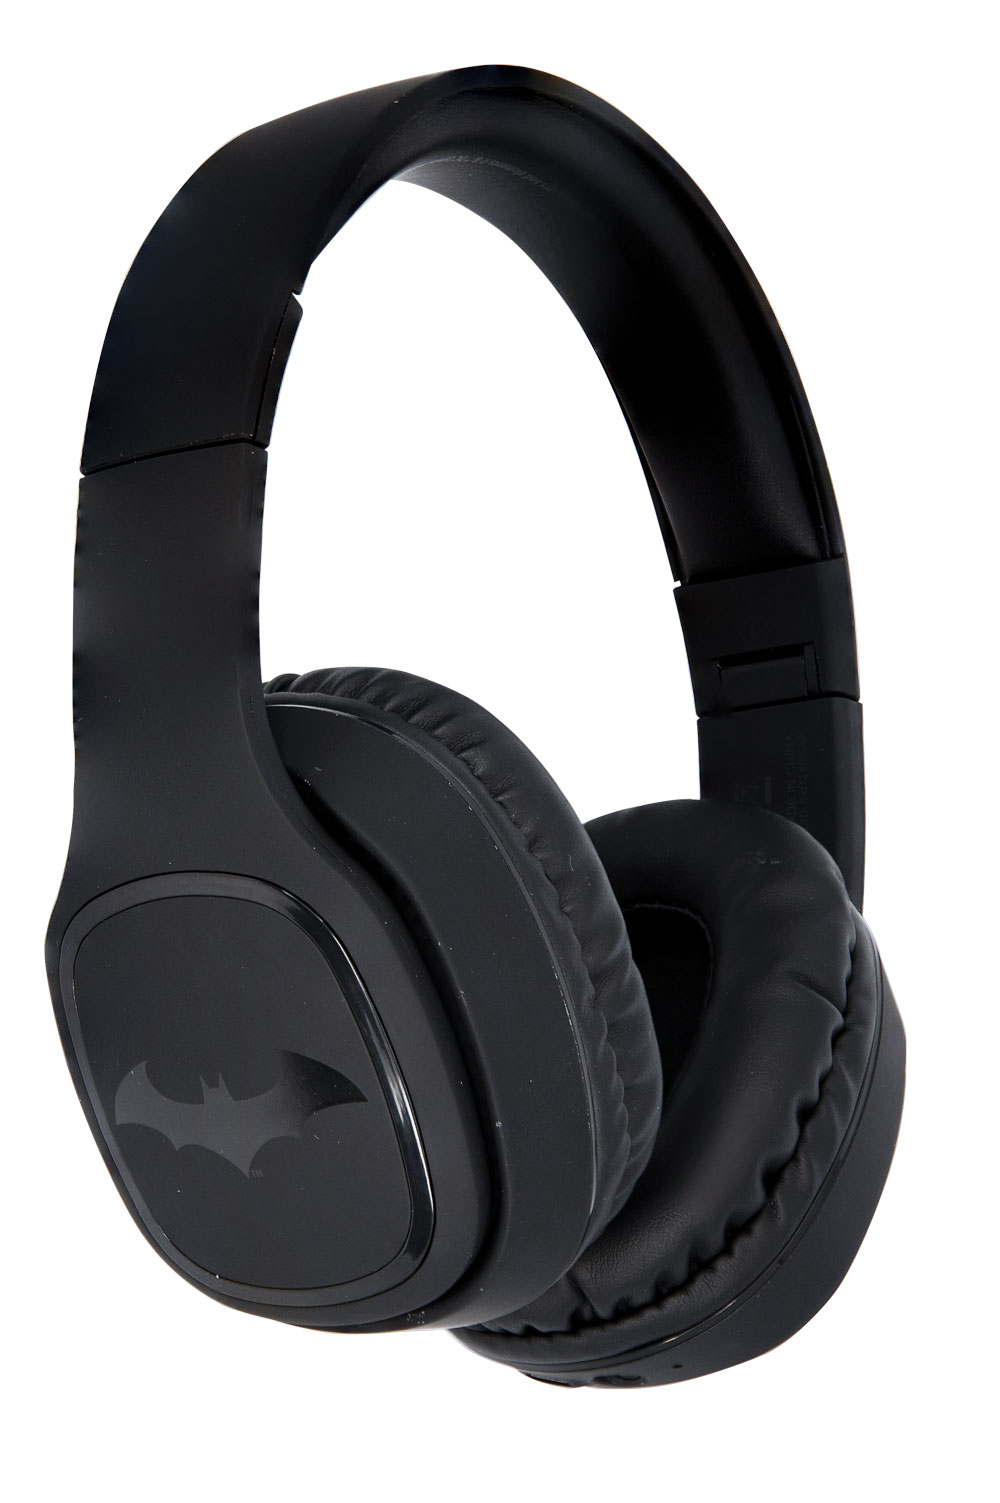 OTL - Junior Wireless Headphones - Batman (856528)